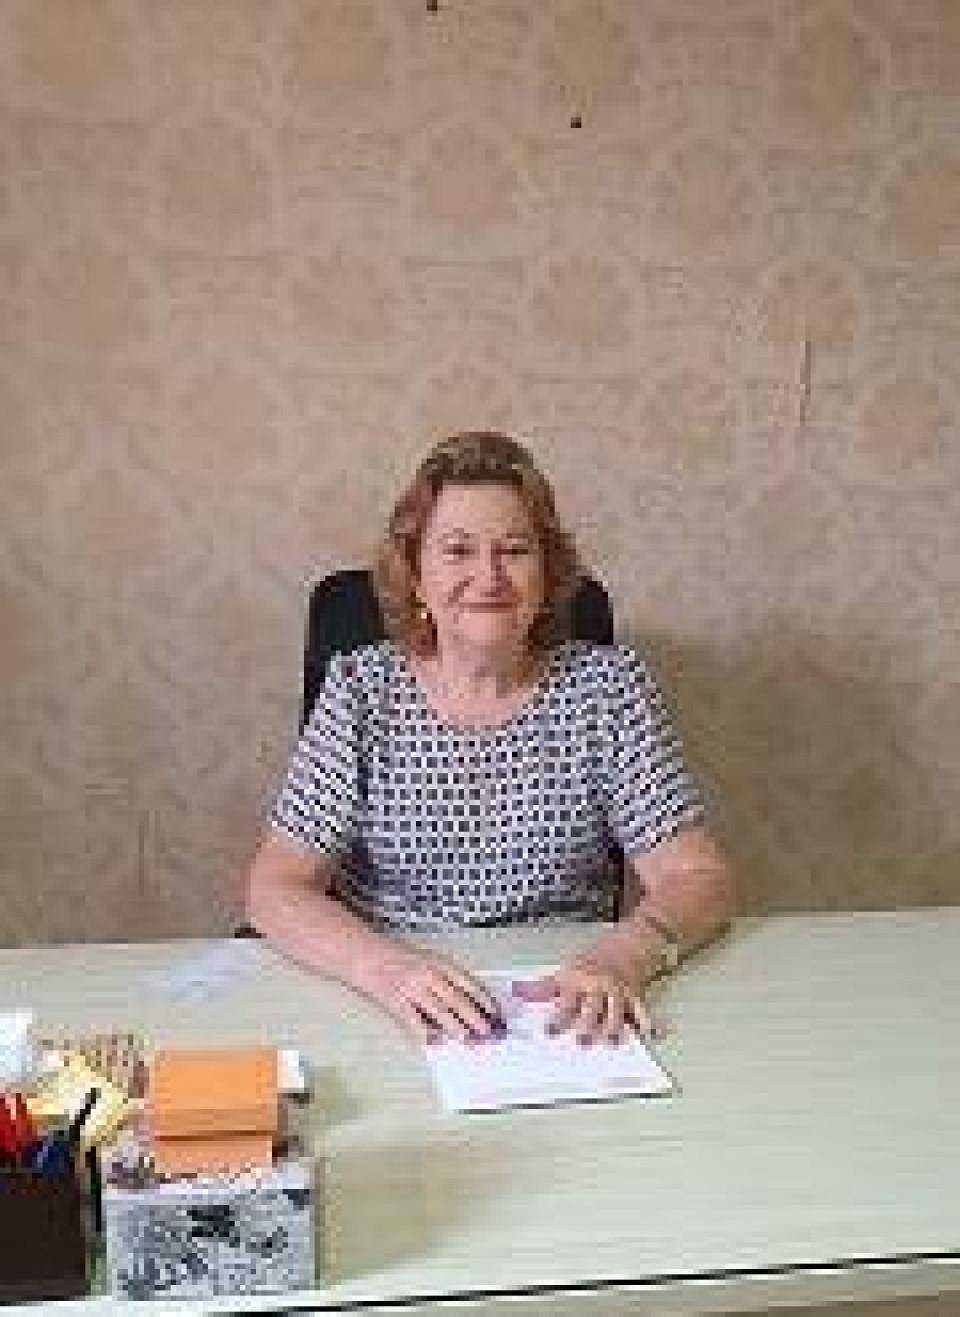 Vera Lúcia Macedo de Santana